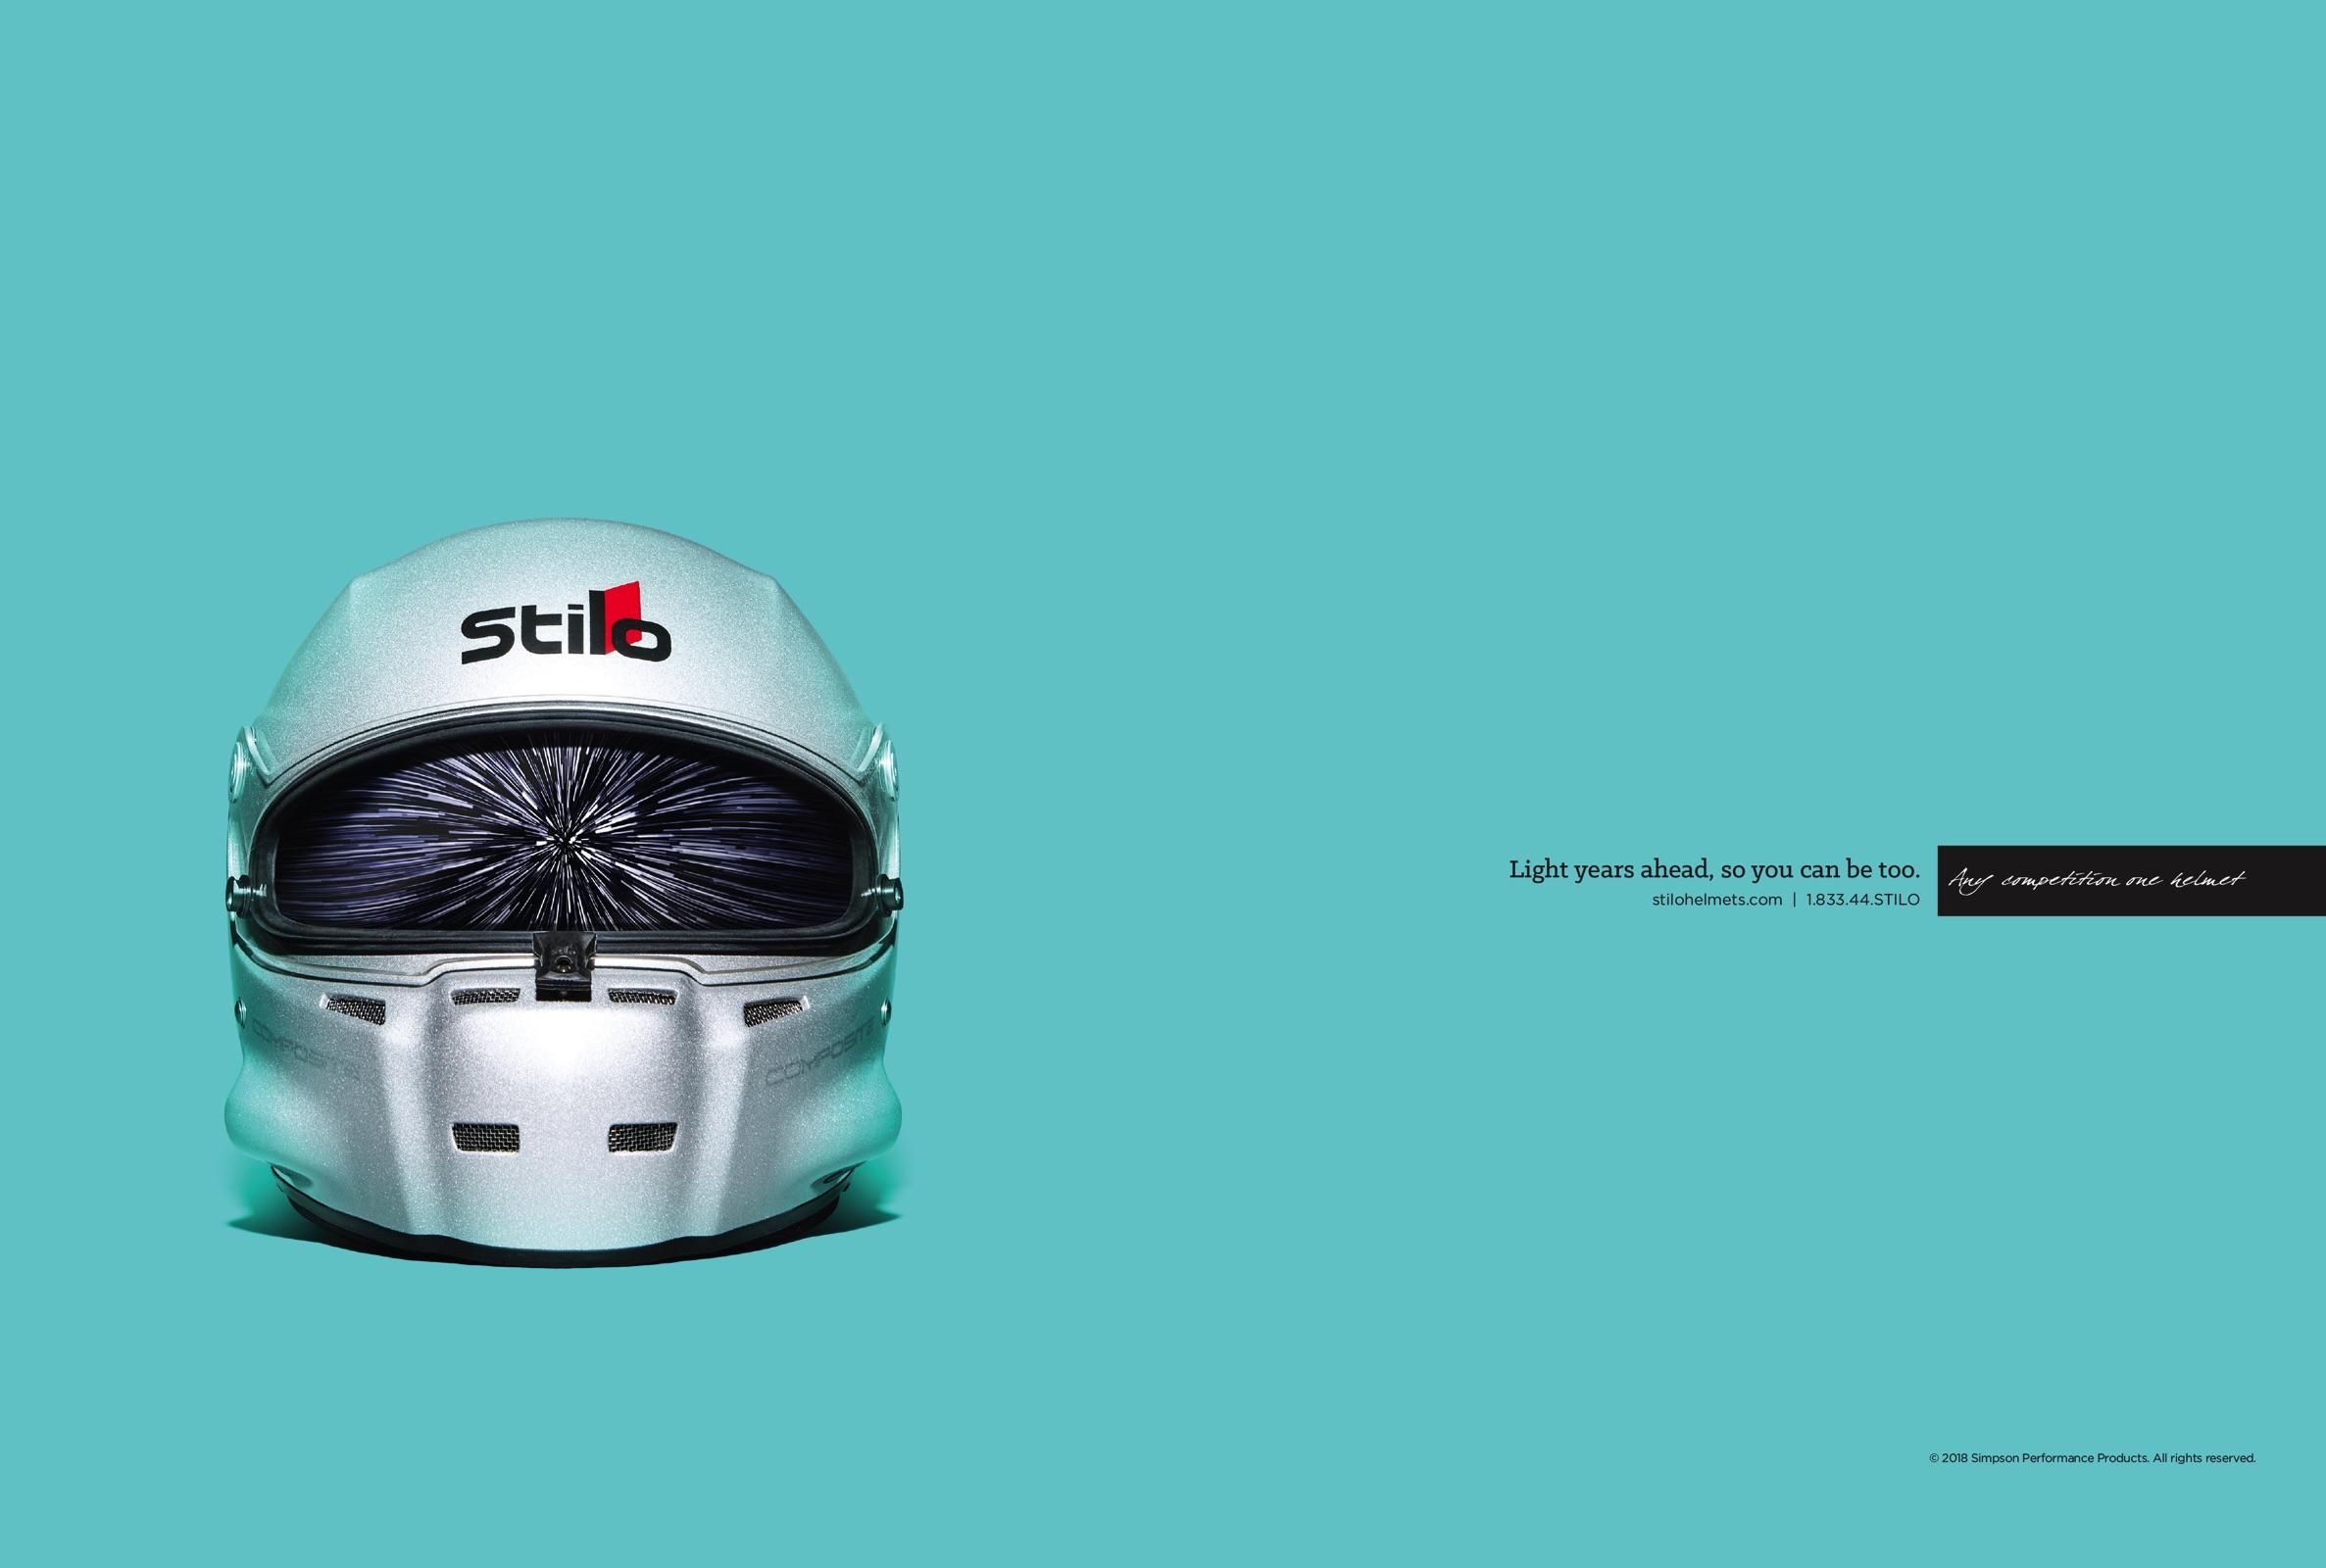 Stilo Print Advert By LGA: Lightyear | Ads of the World™